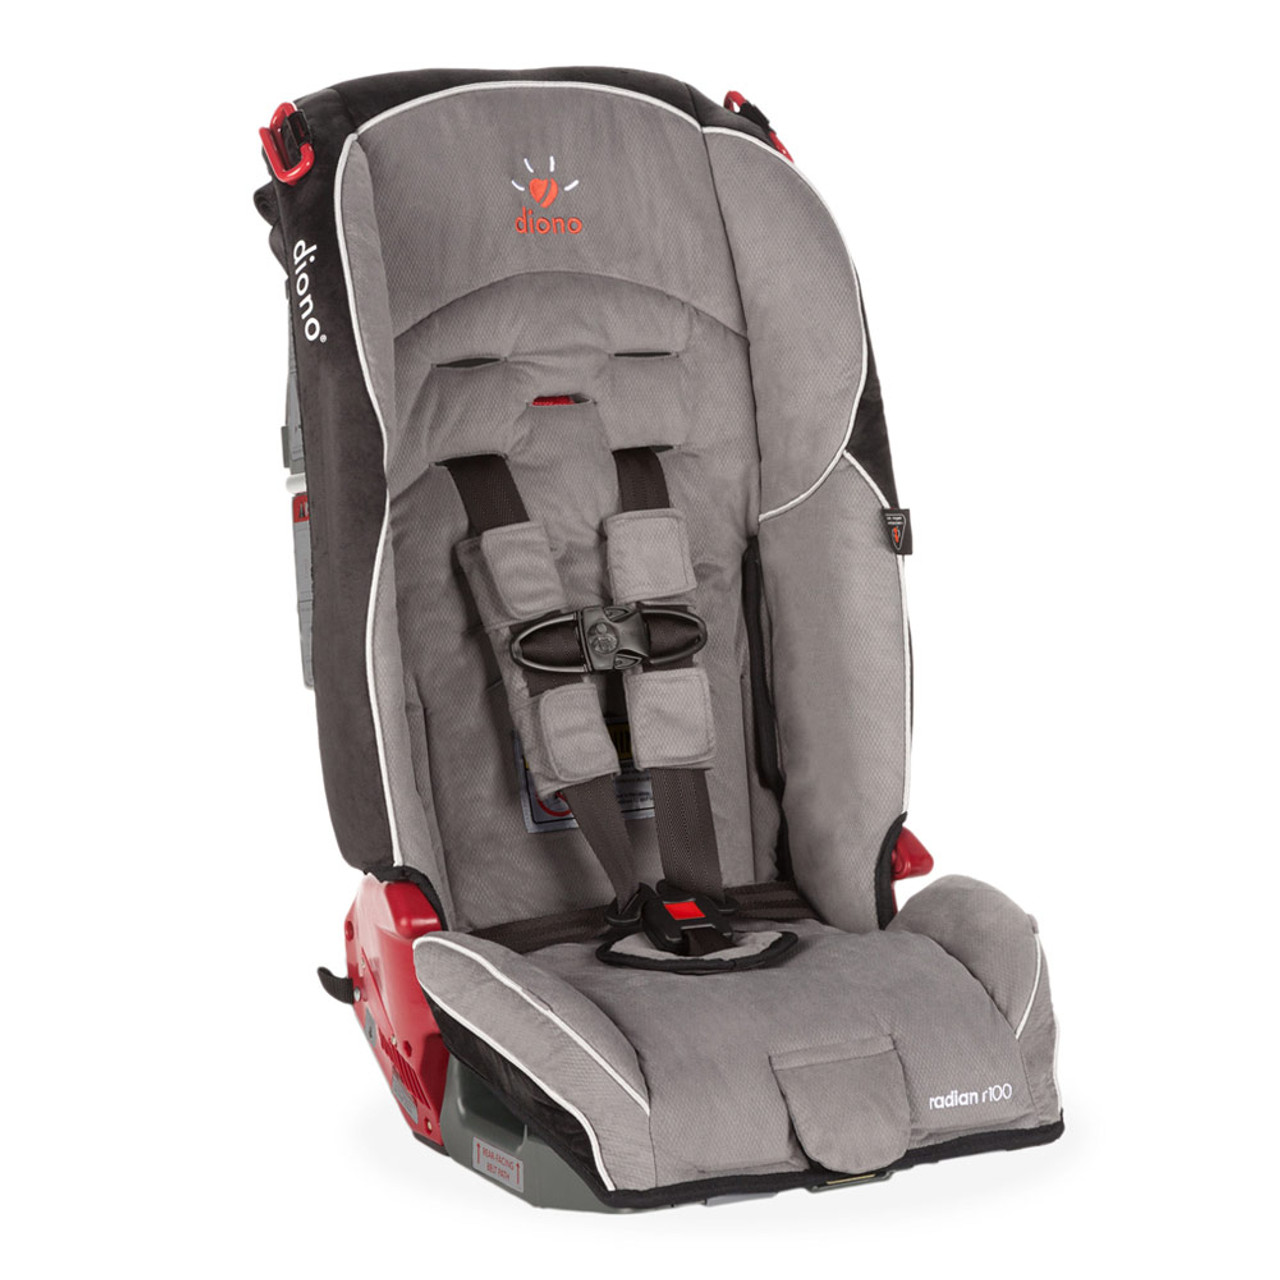 Diono Radian R100 Convertible Car Seat - Storm - Dear-Born Baby